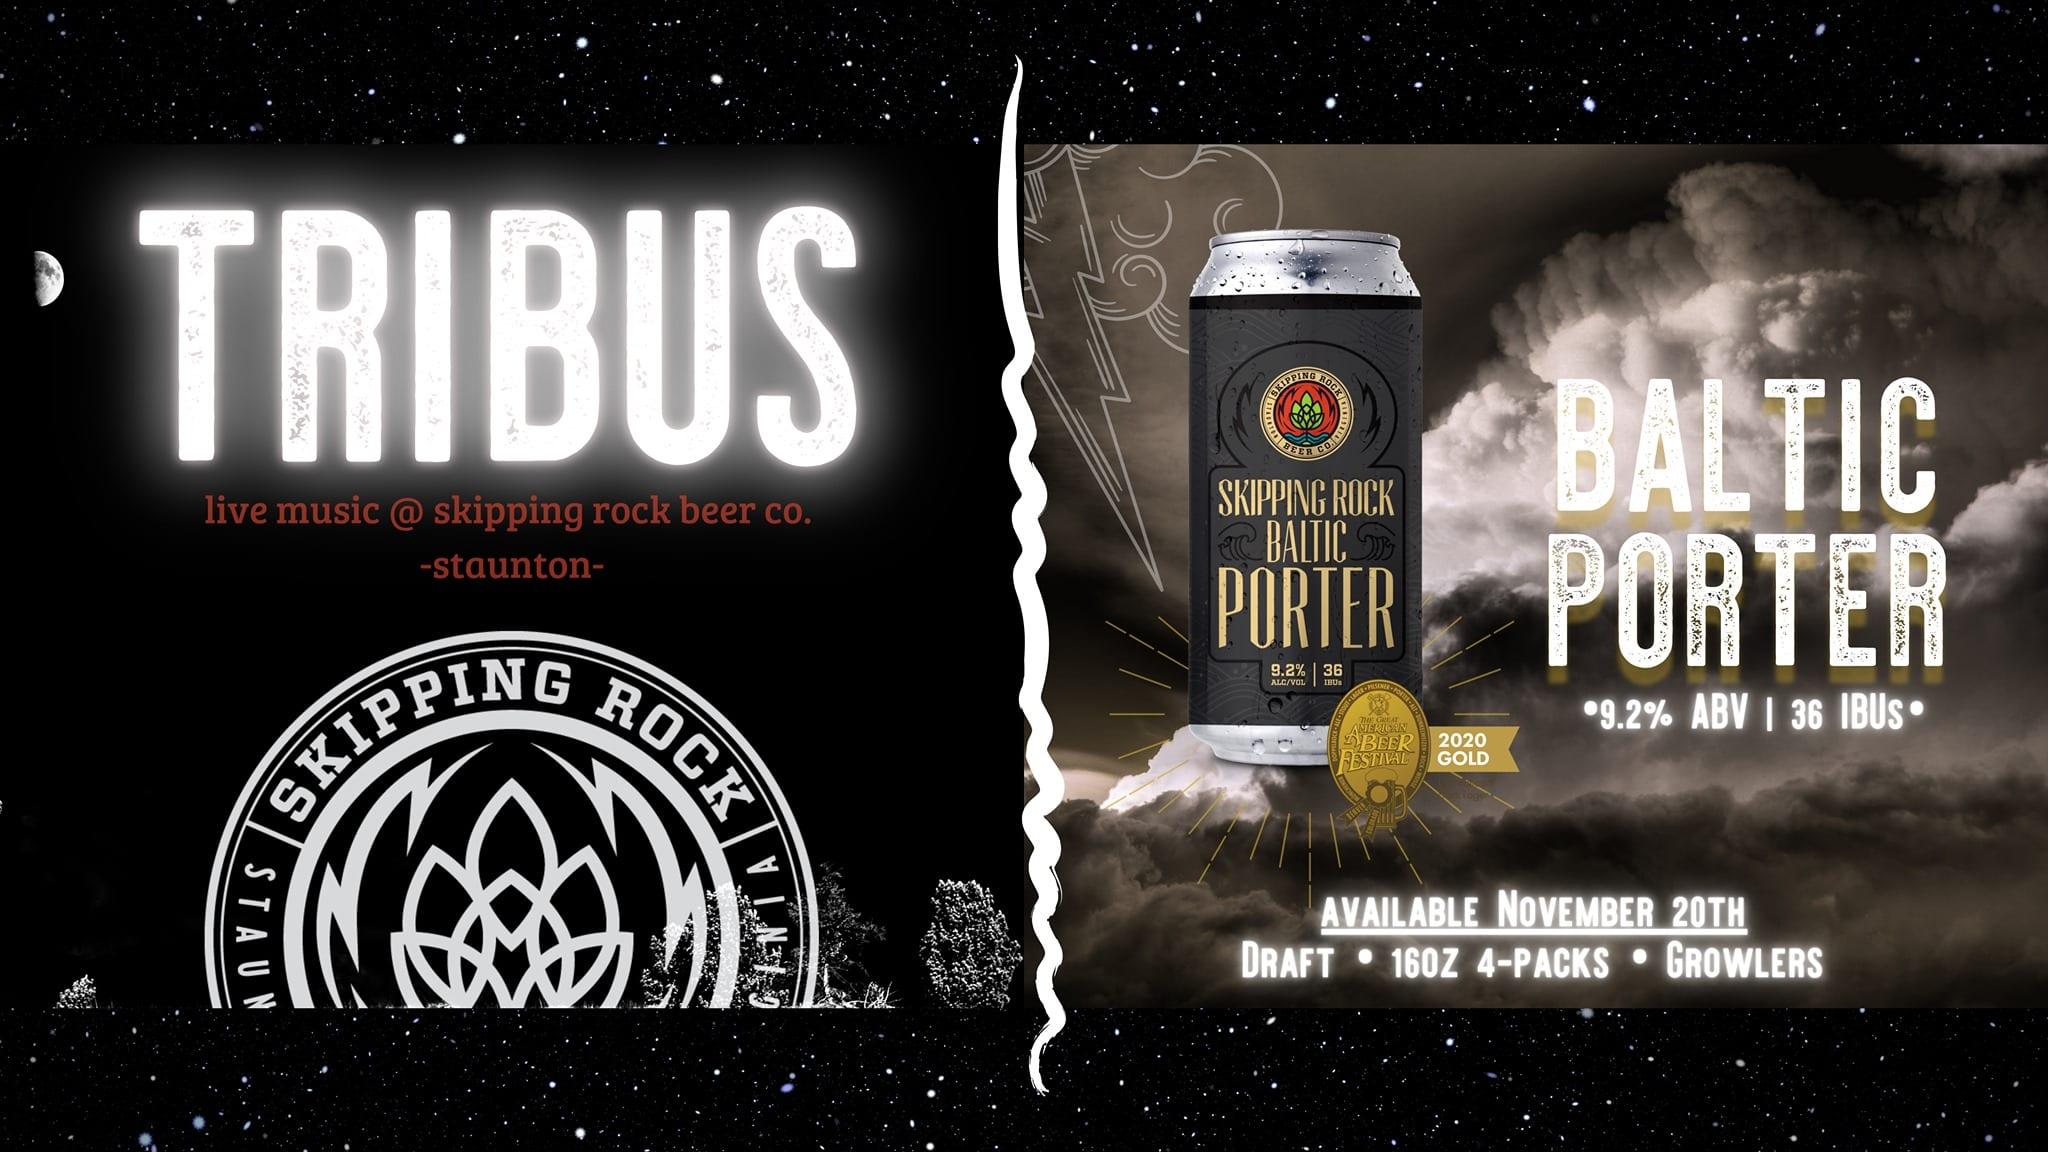 Tribus + Baltic Porter Release at Skipping Rock >Staunton